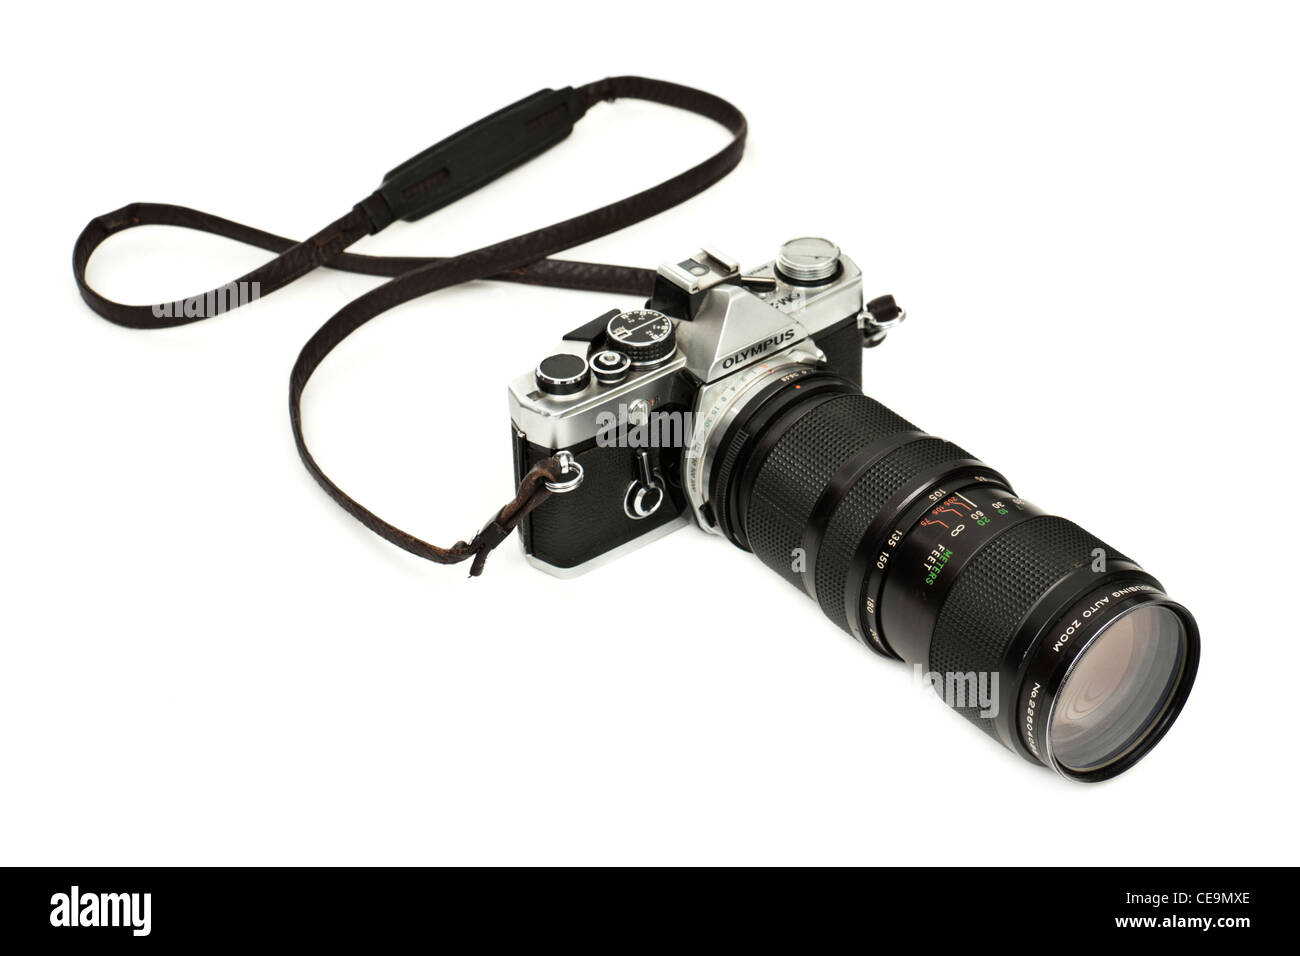 Vintage 35mm Olympus OM-2 SLR film camera with Vivitar zoom